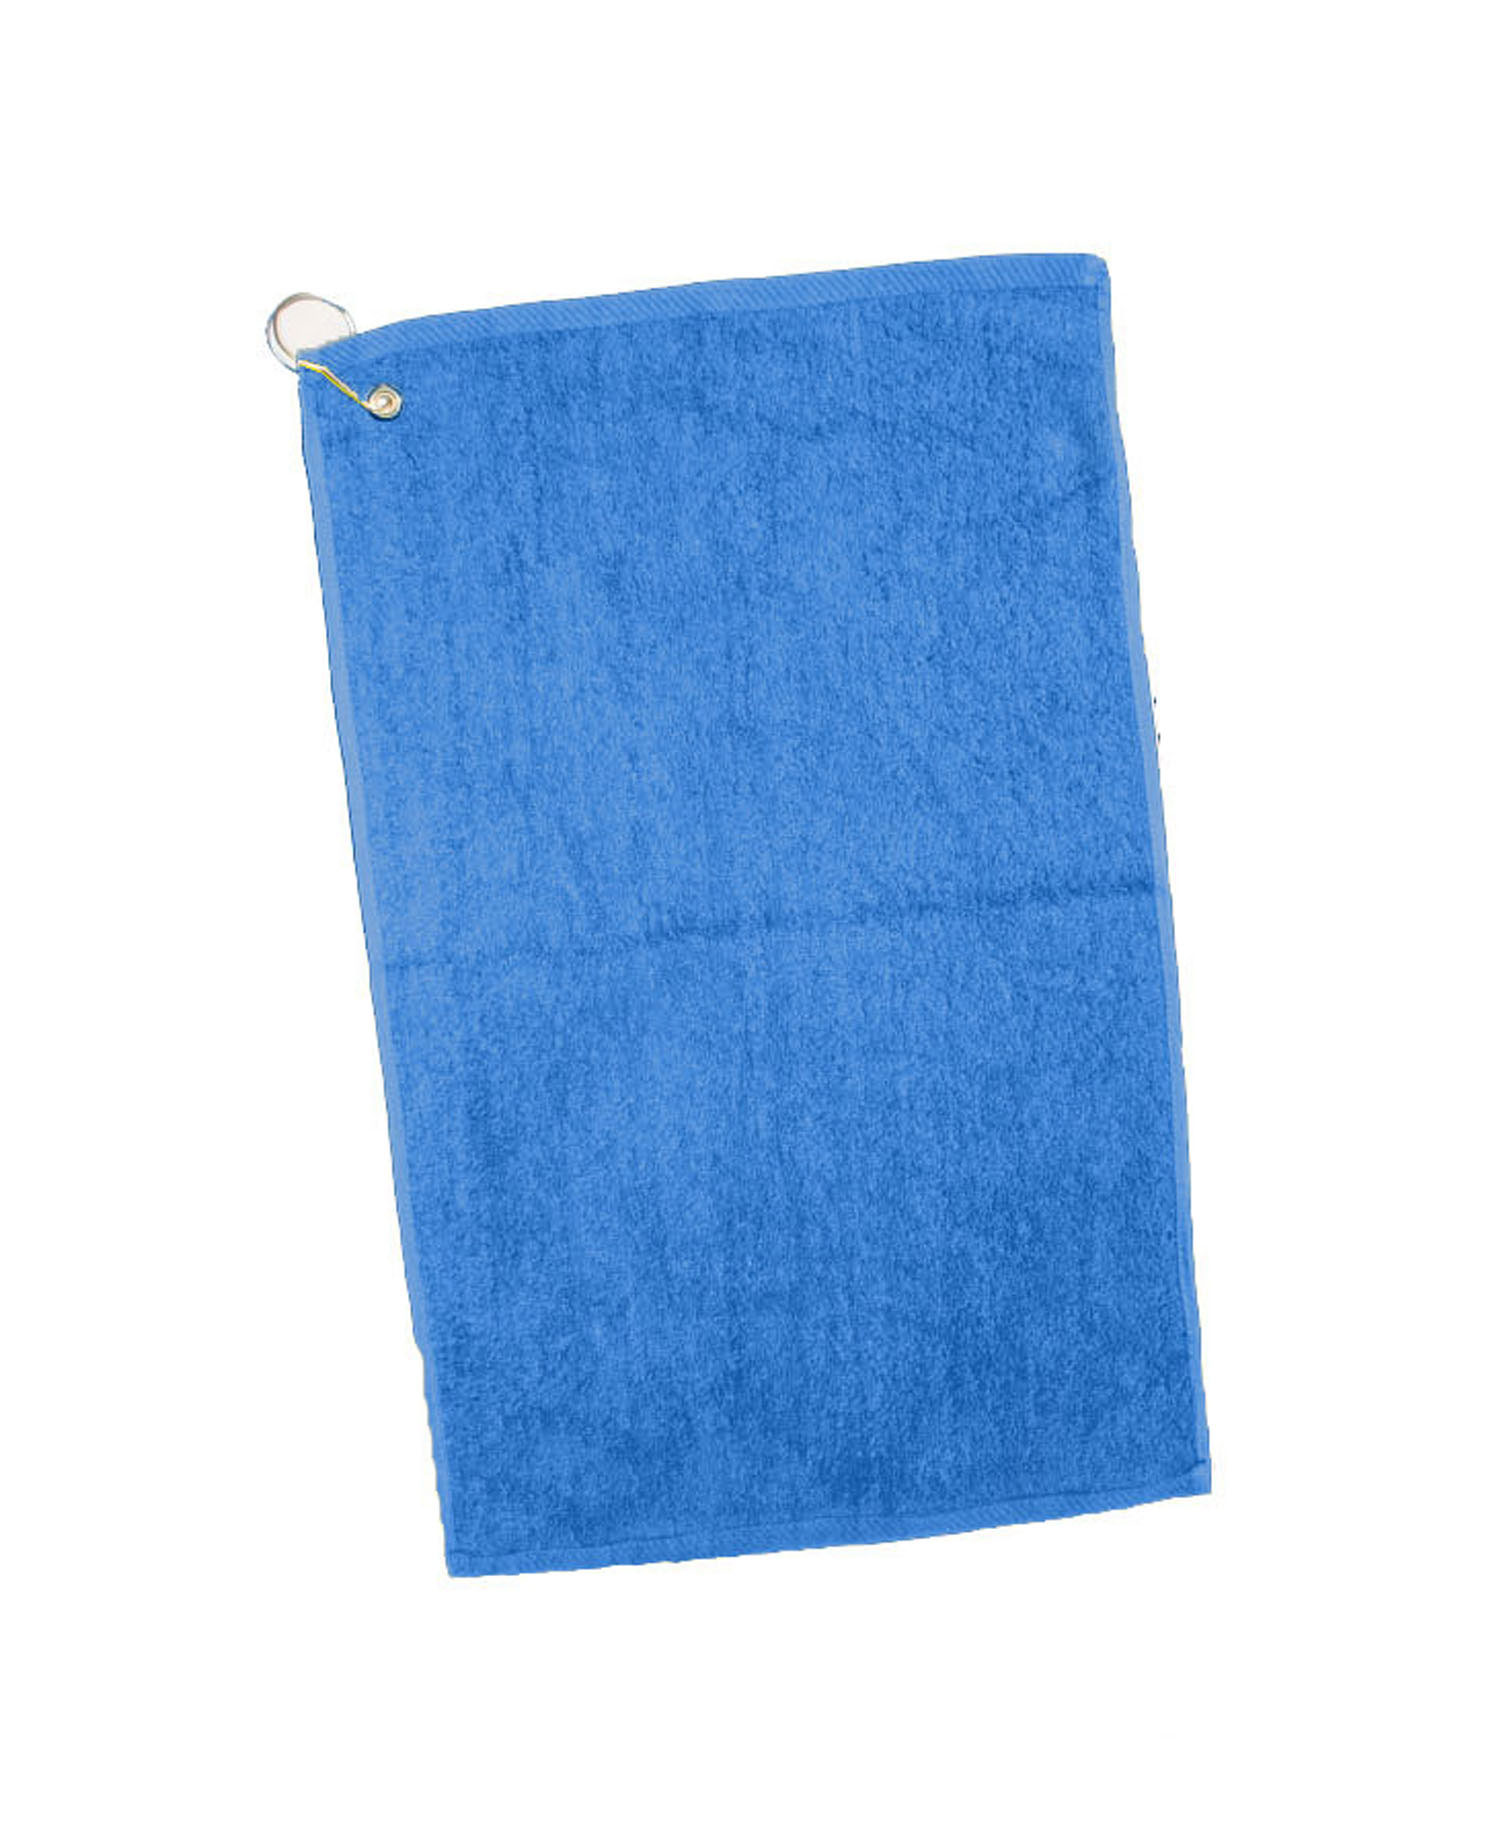 Q-Tees of California - Q0T200Cg Hand Towel Corner Grommet